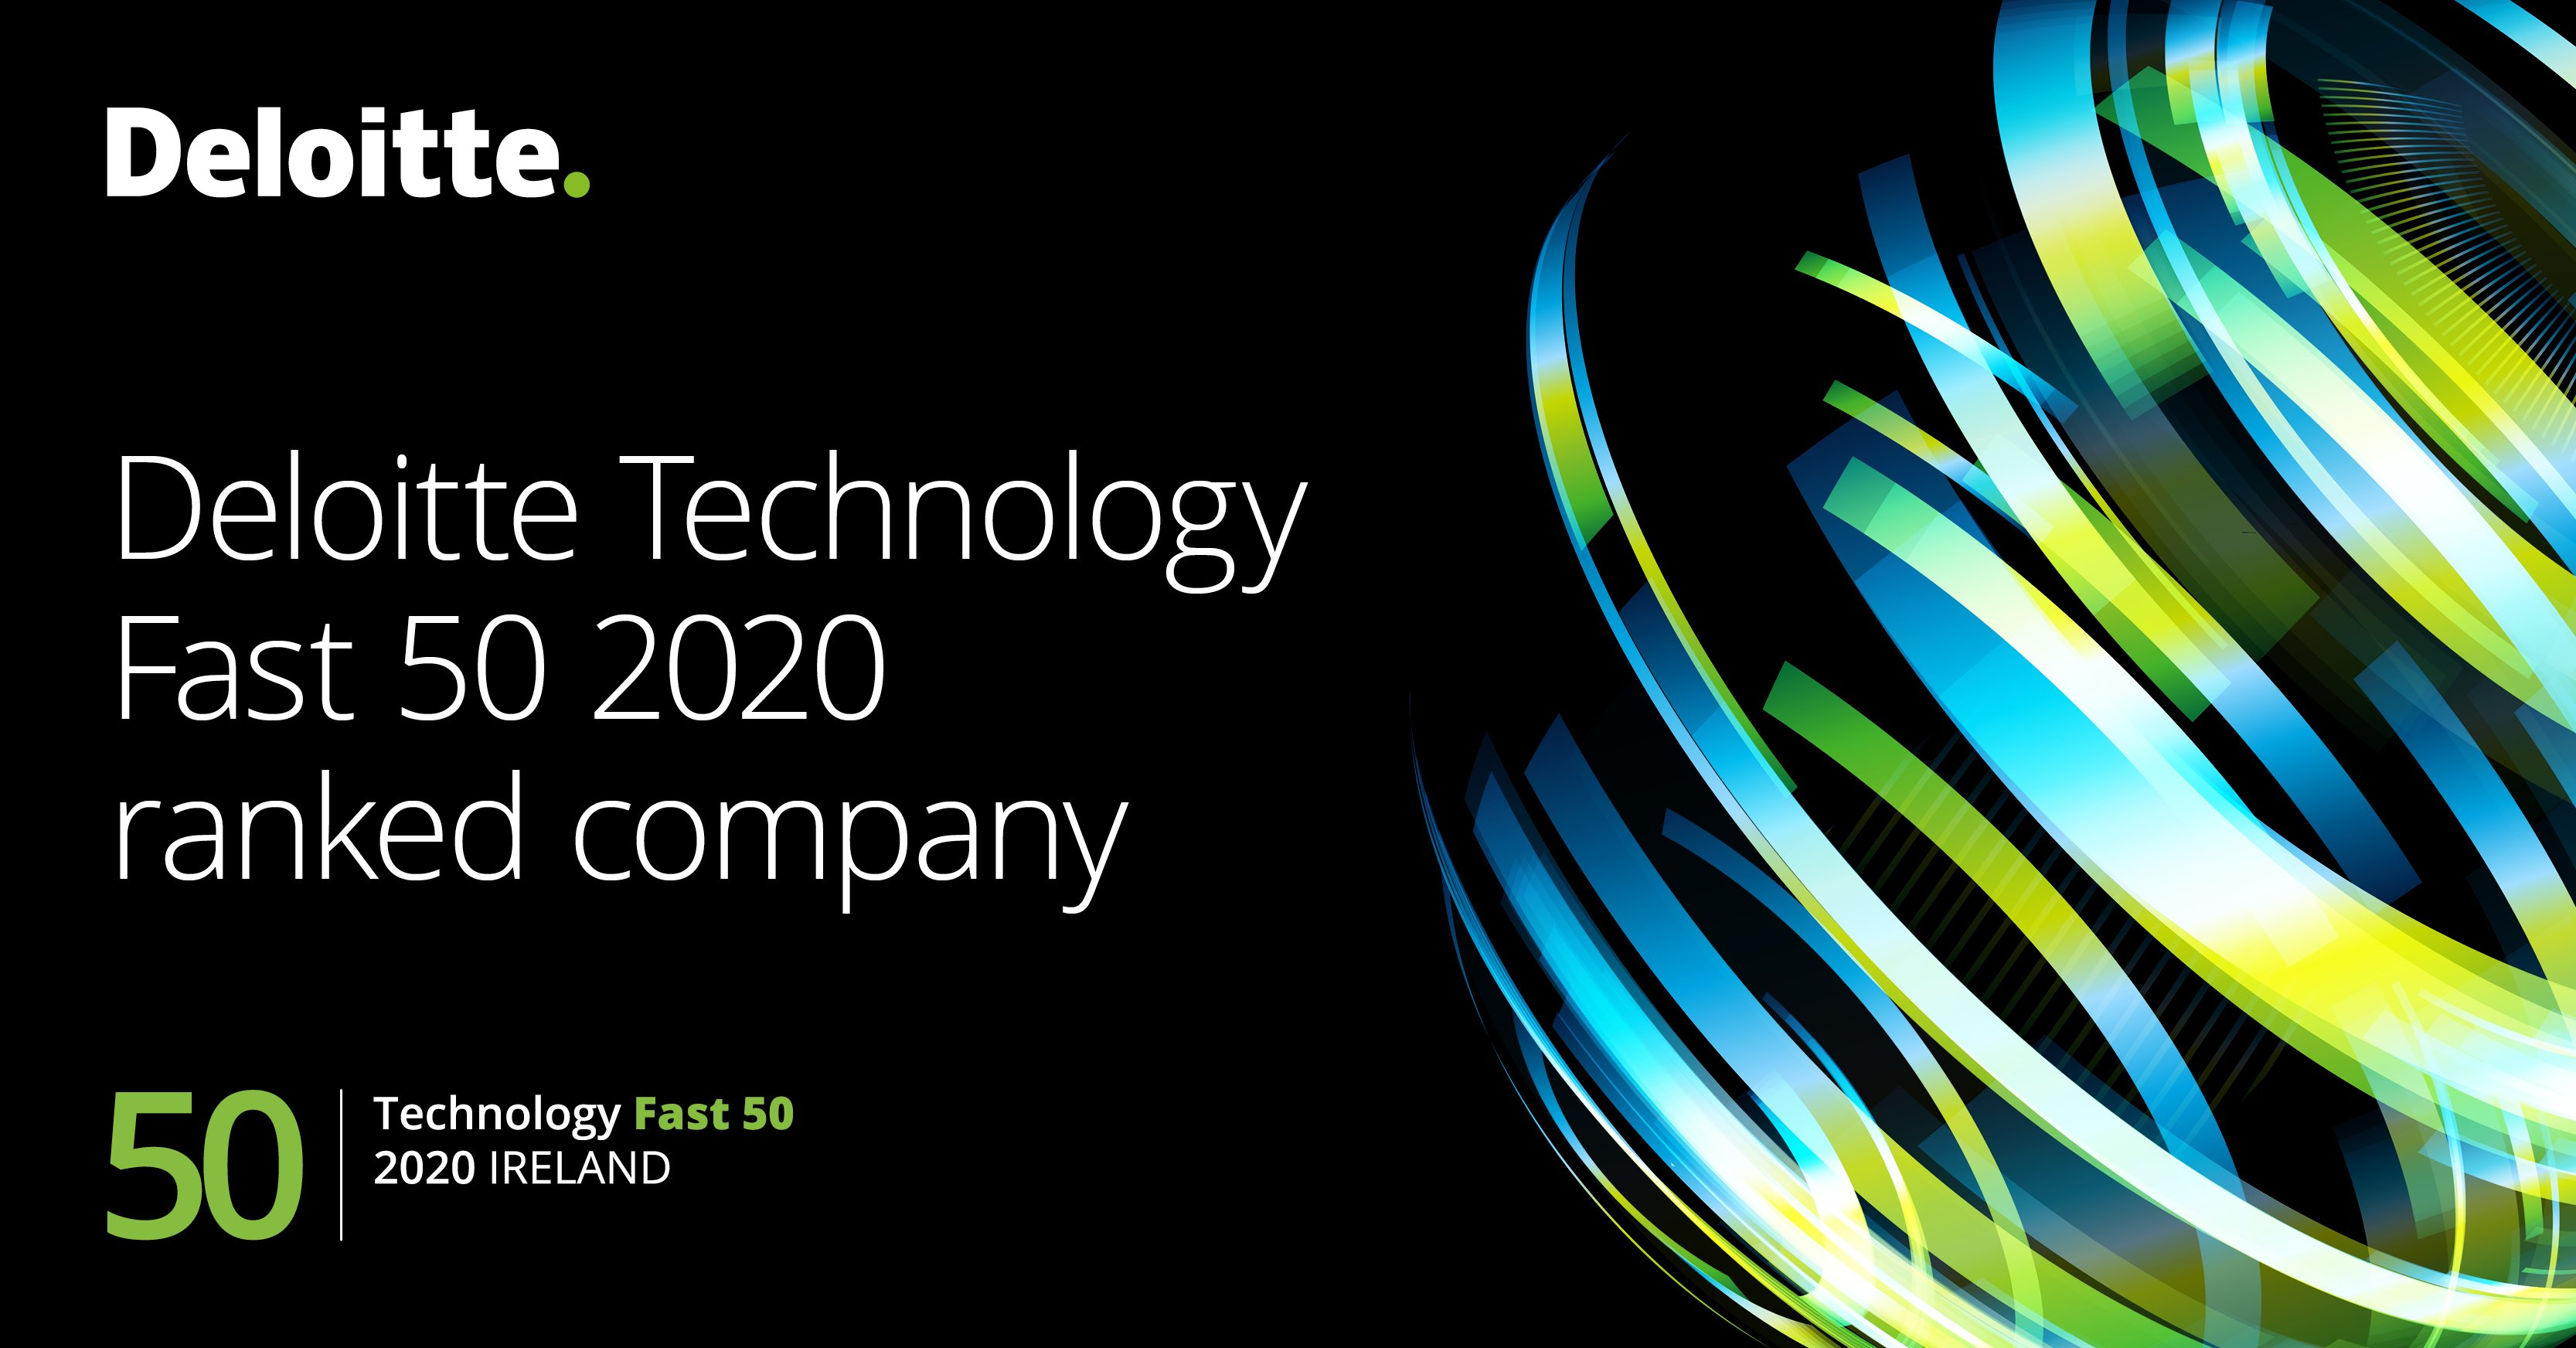 Deloitte Fast 50 Awards 2020 - MCO